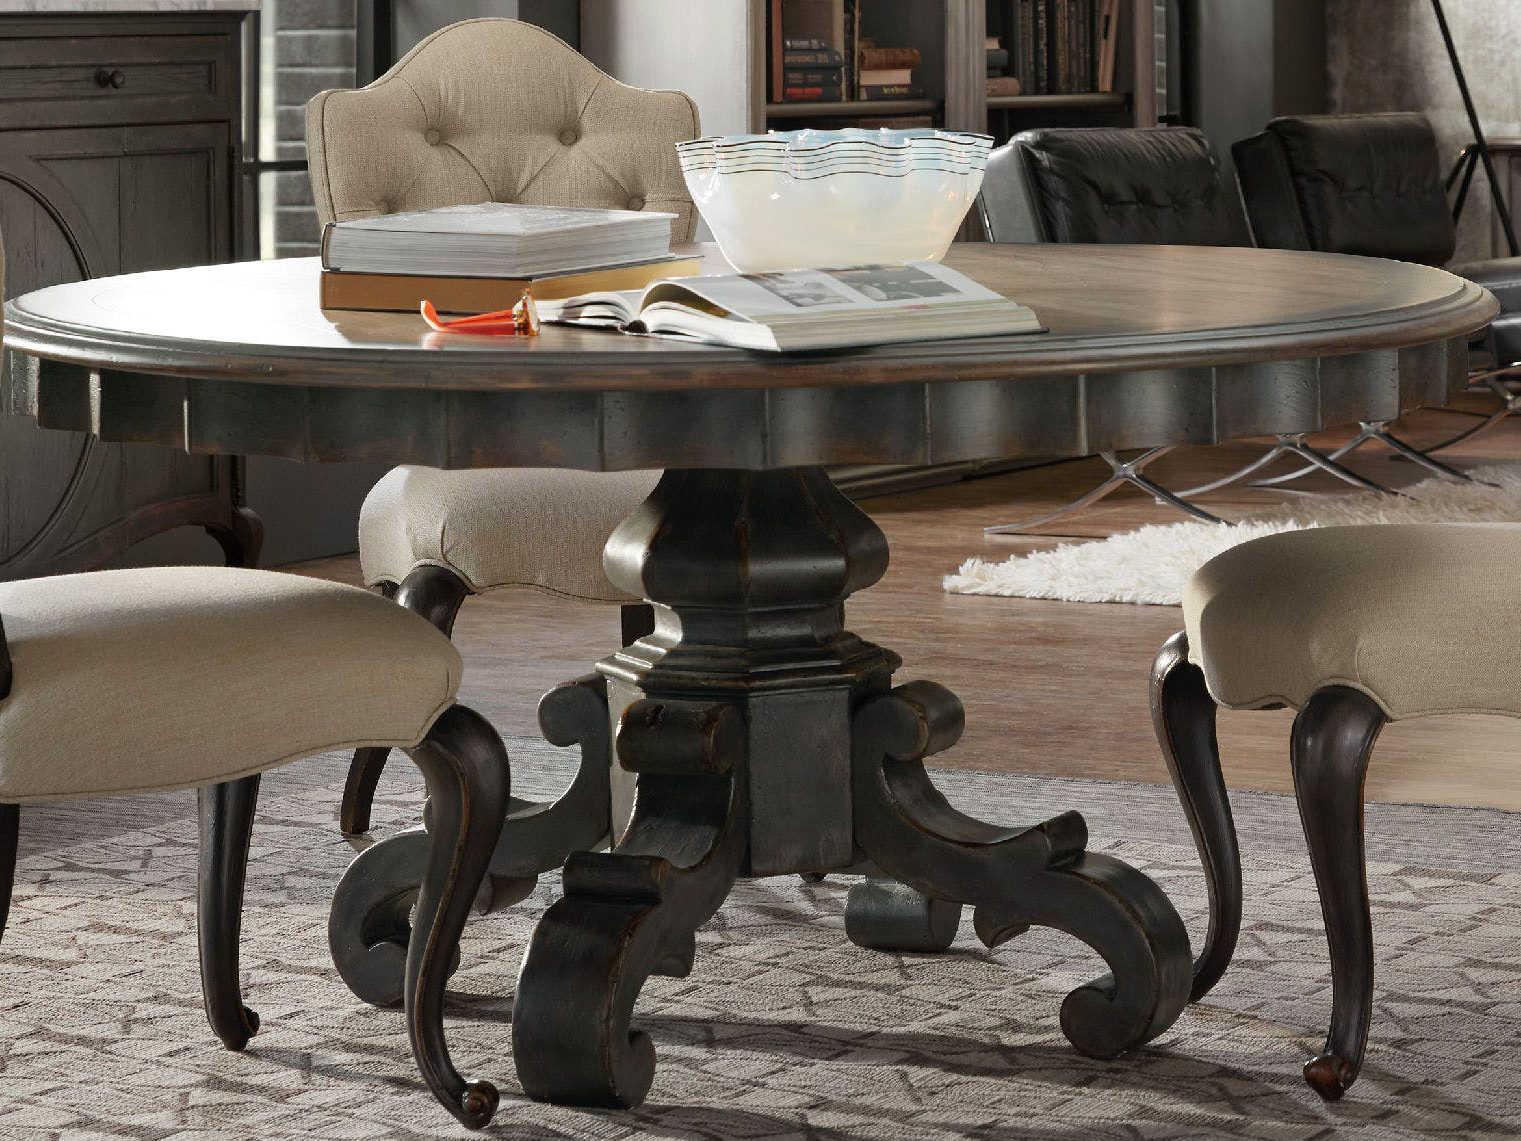 Hooker Furniture Arabella Warm Wood Gray 60 Wide Round Pedestal Dining Table Hoo161075201gry